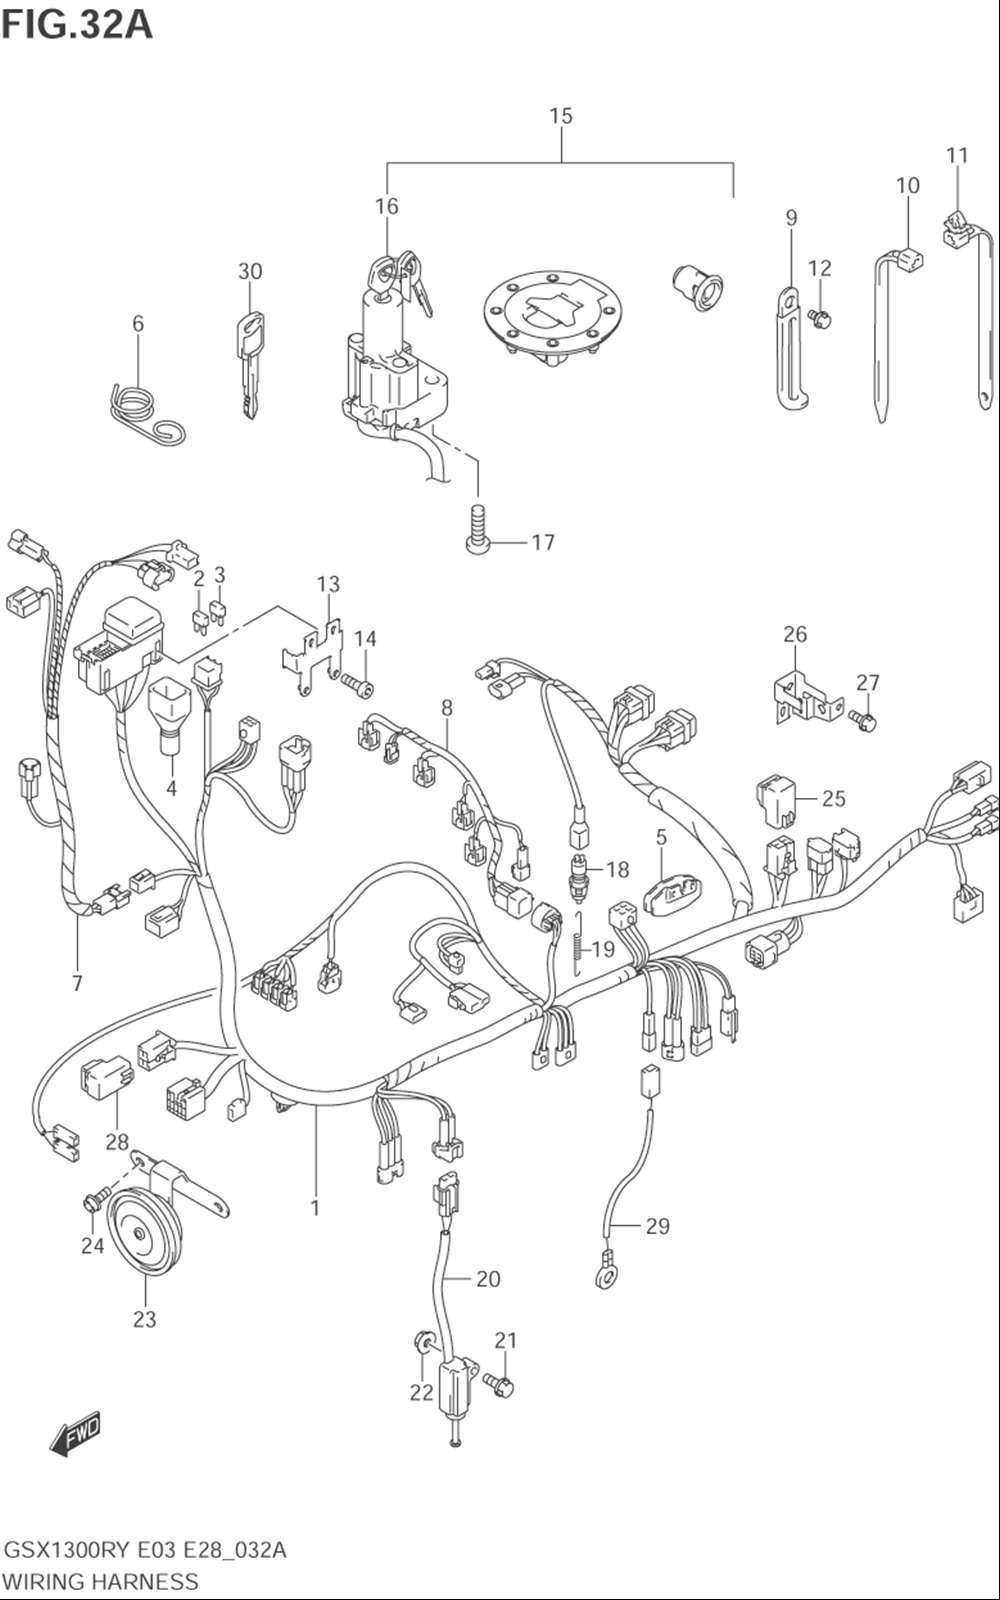 1998 suzuki rm125 service manual